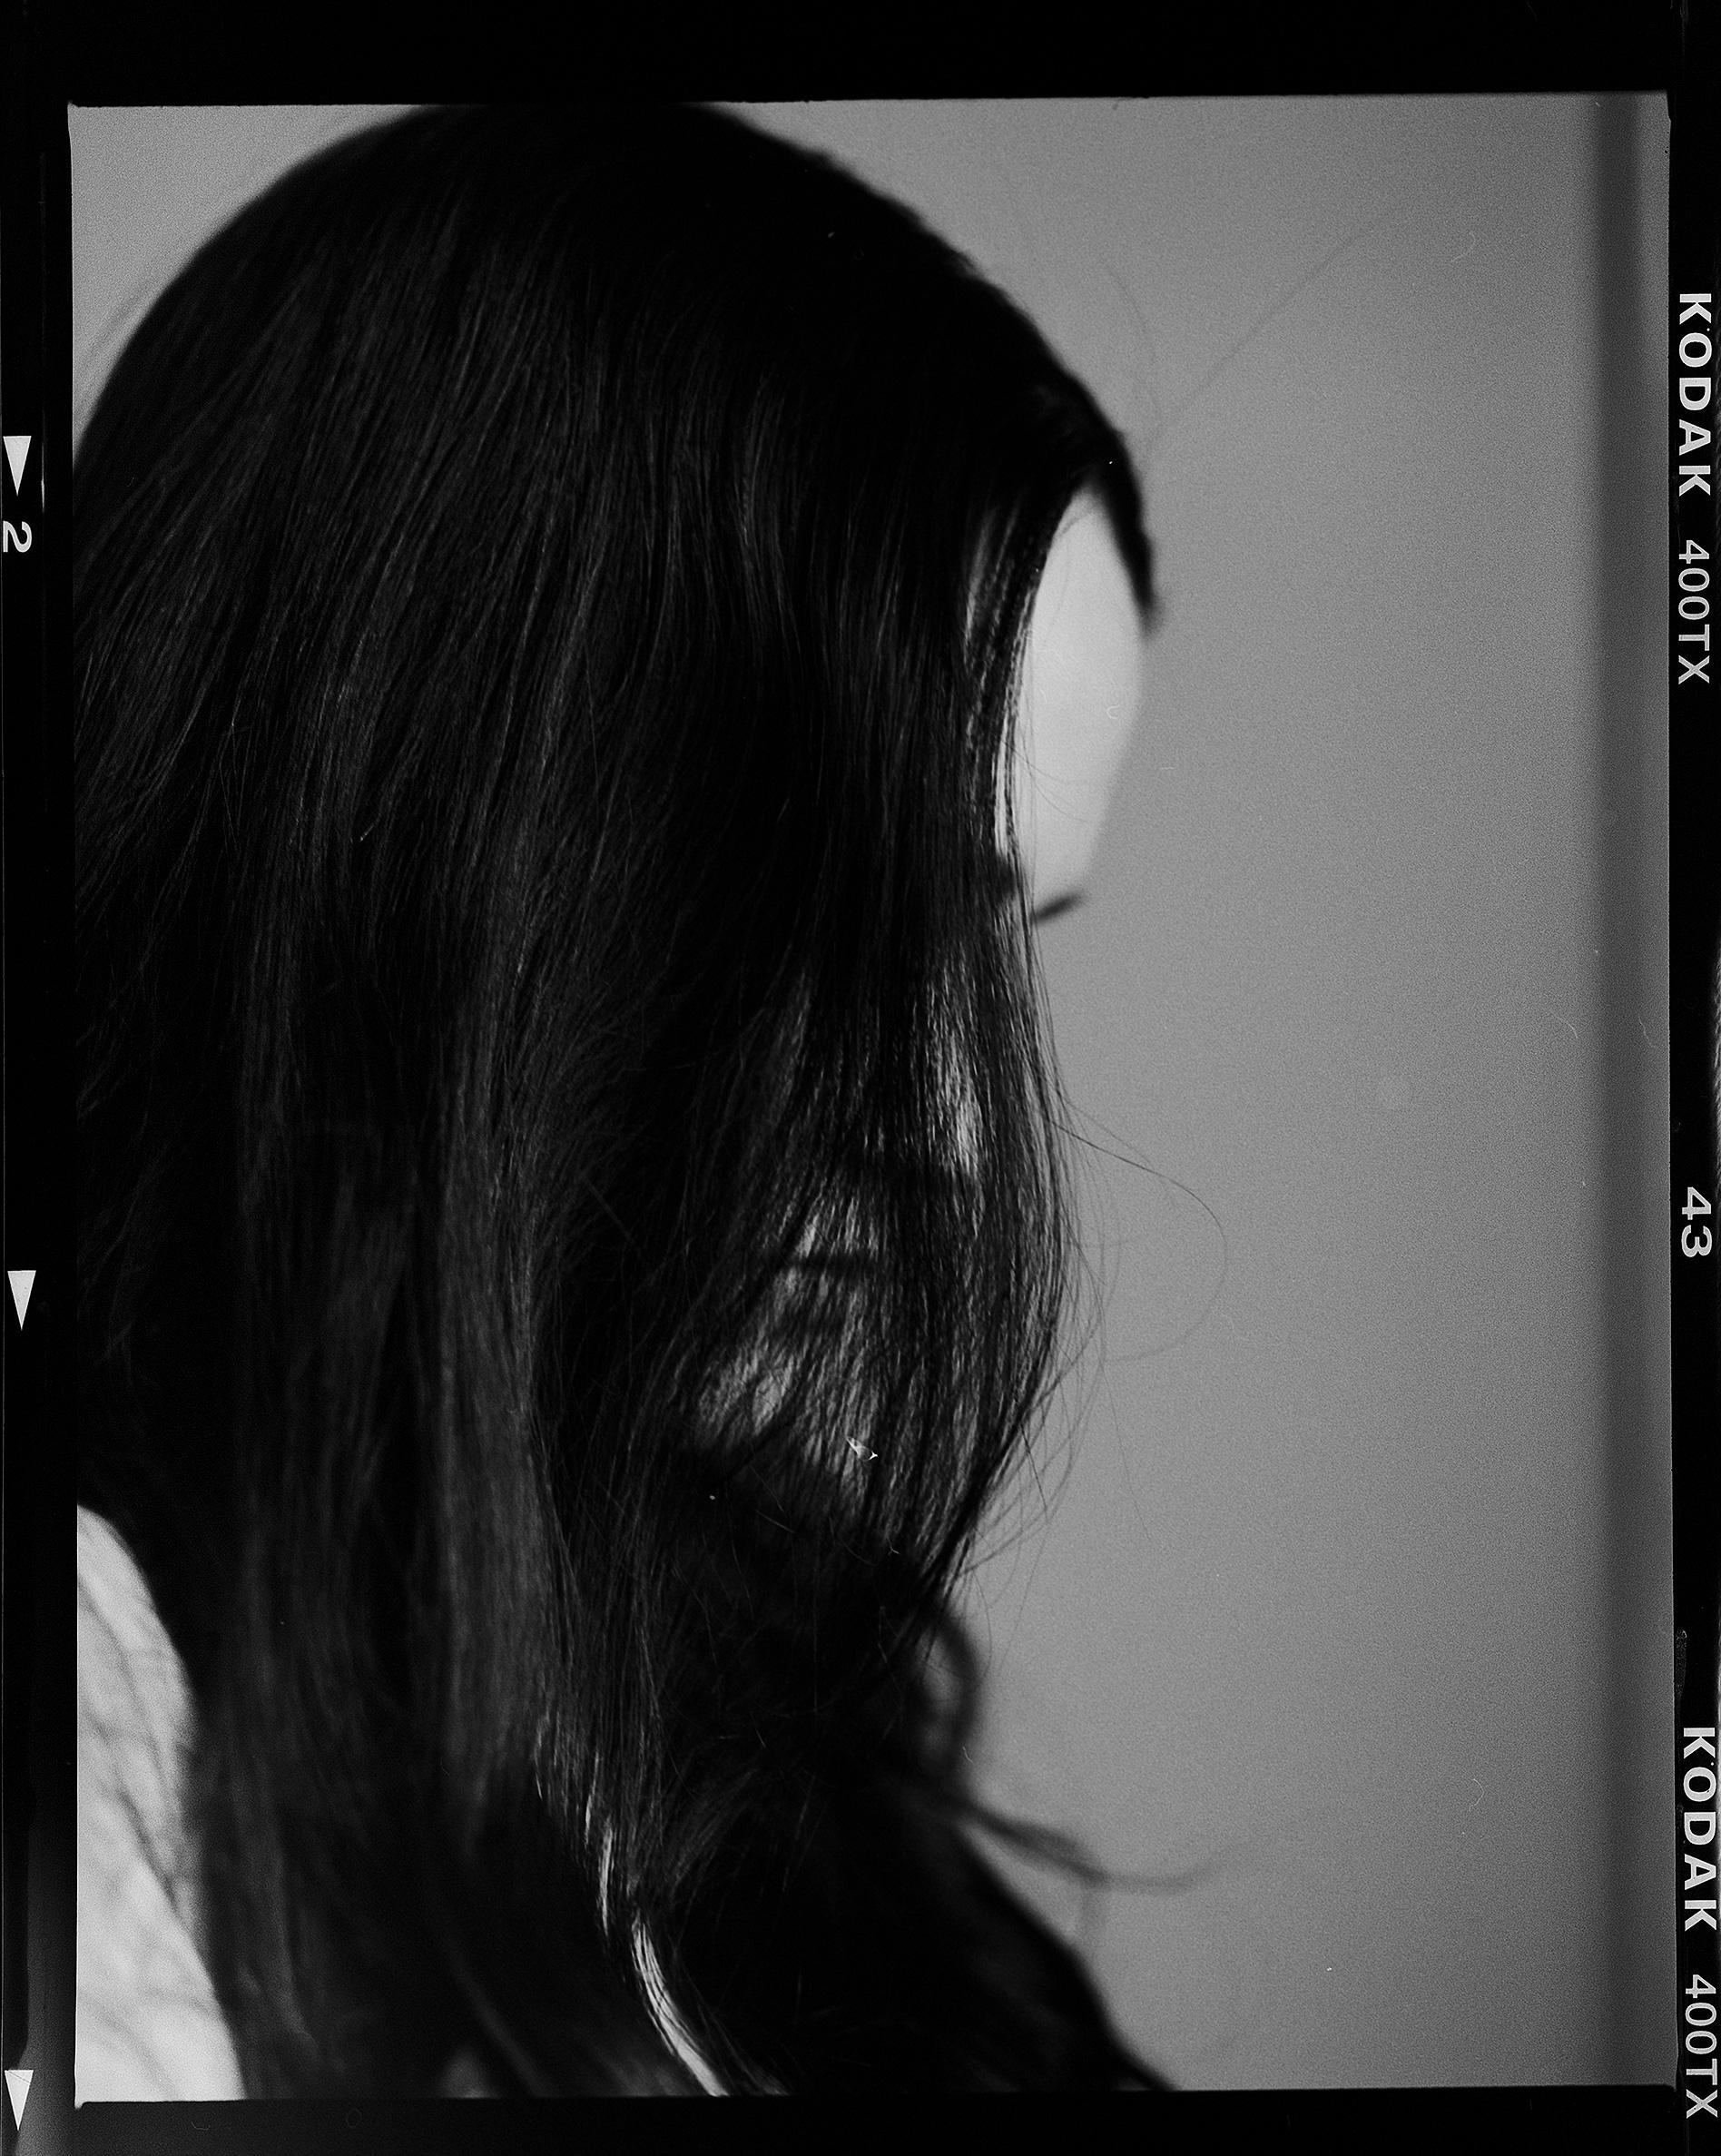 Jasmin-bw-1.jpg